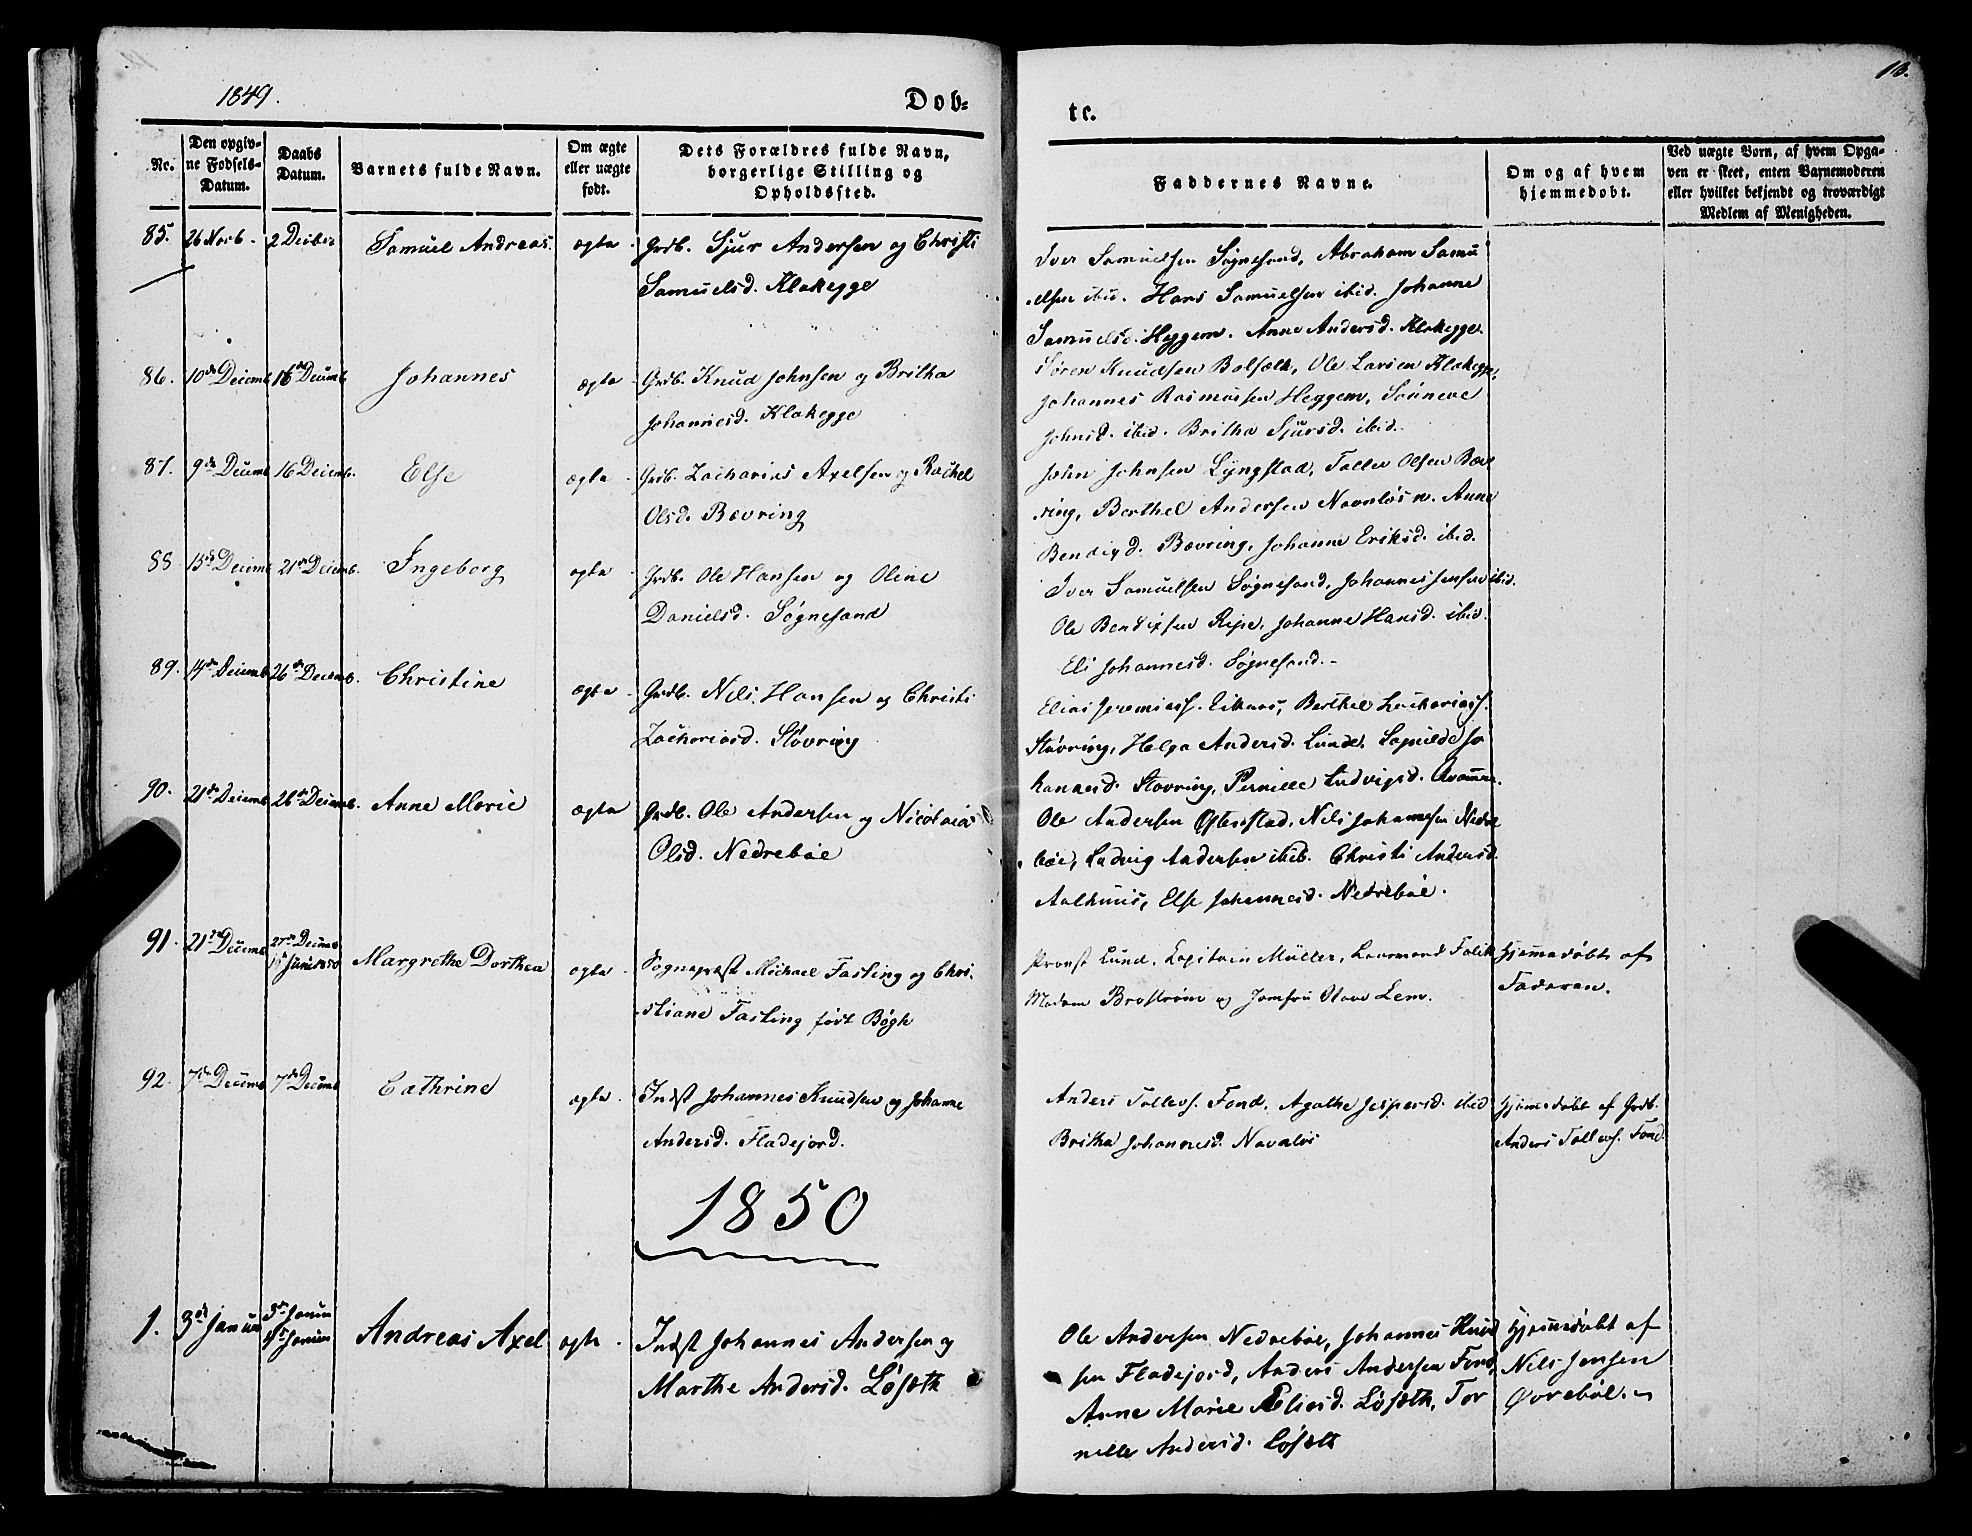 SAB, Jølster sokneprestembete, H/Haa/Haaa/L0010: Parish register (official) no. A 10, 1847-1865, p. 13